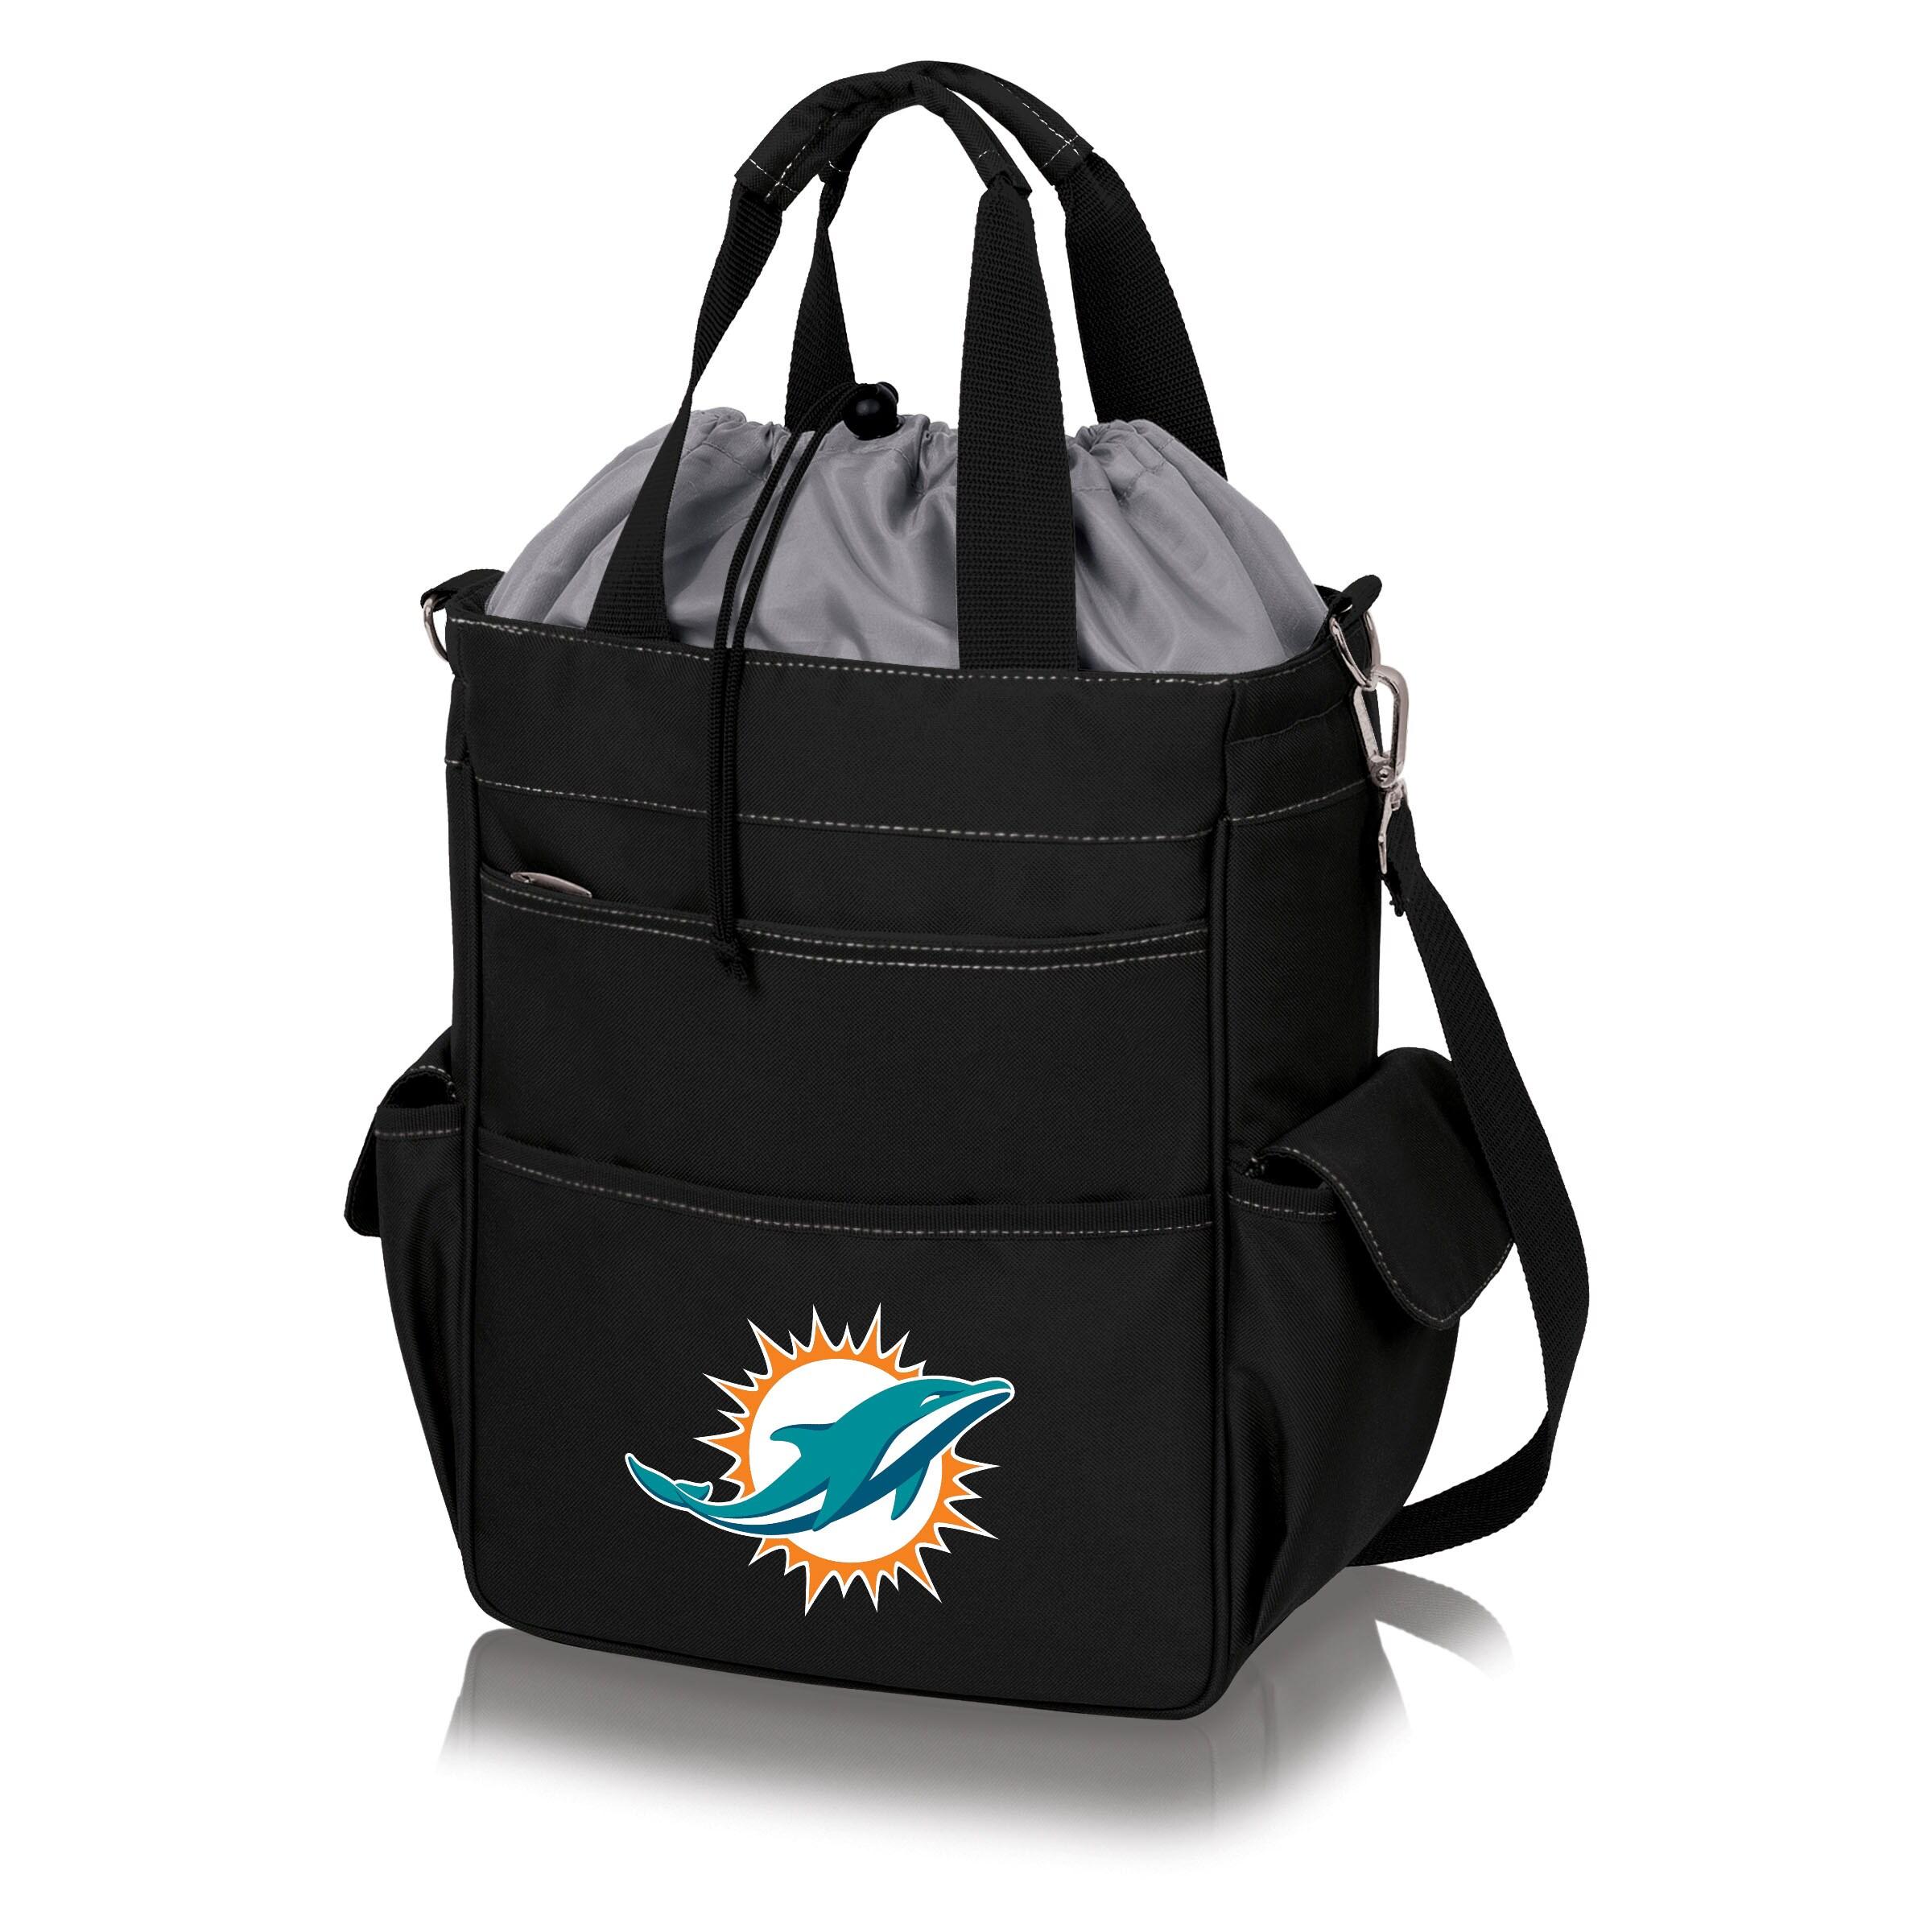 Miami Dolphins Activo Cooler Tote - Black